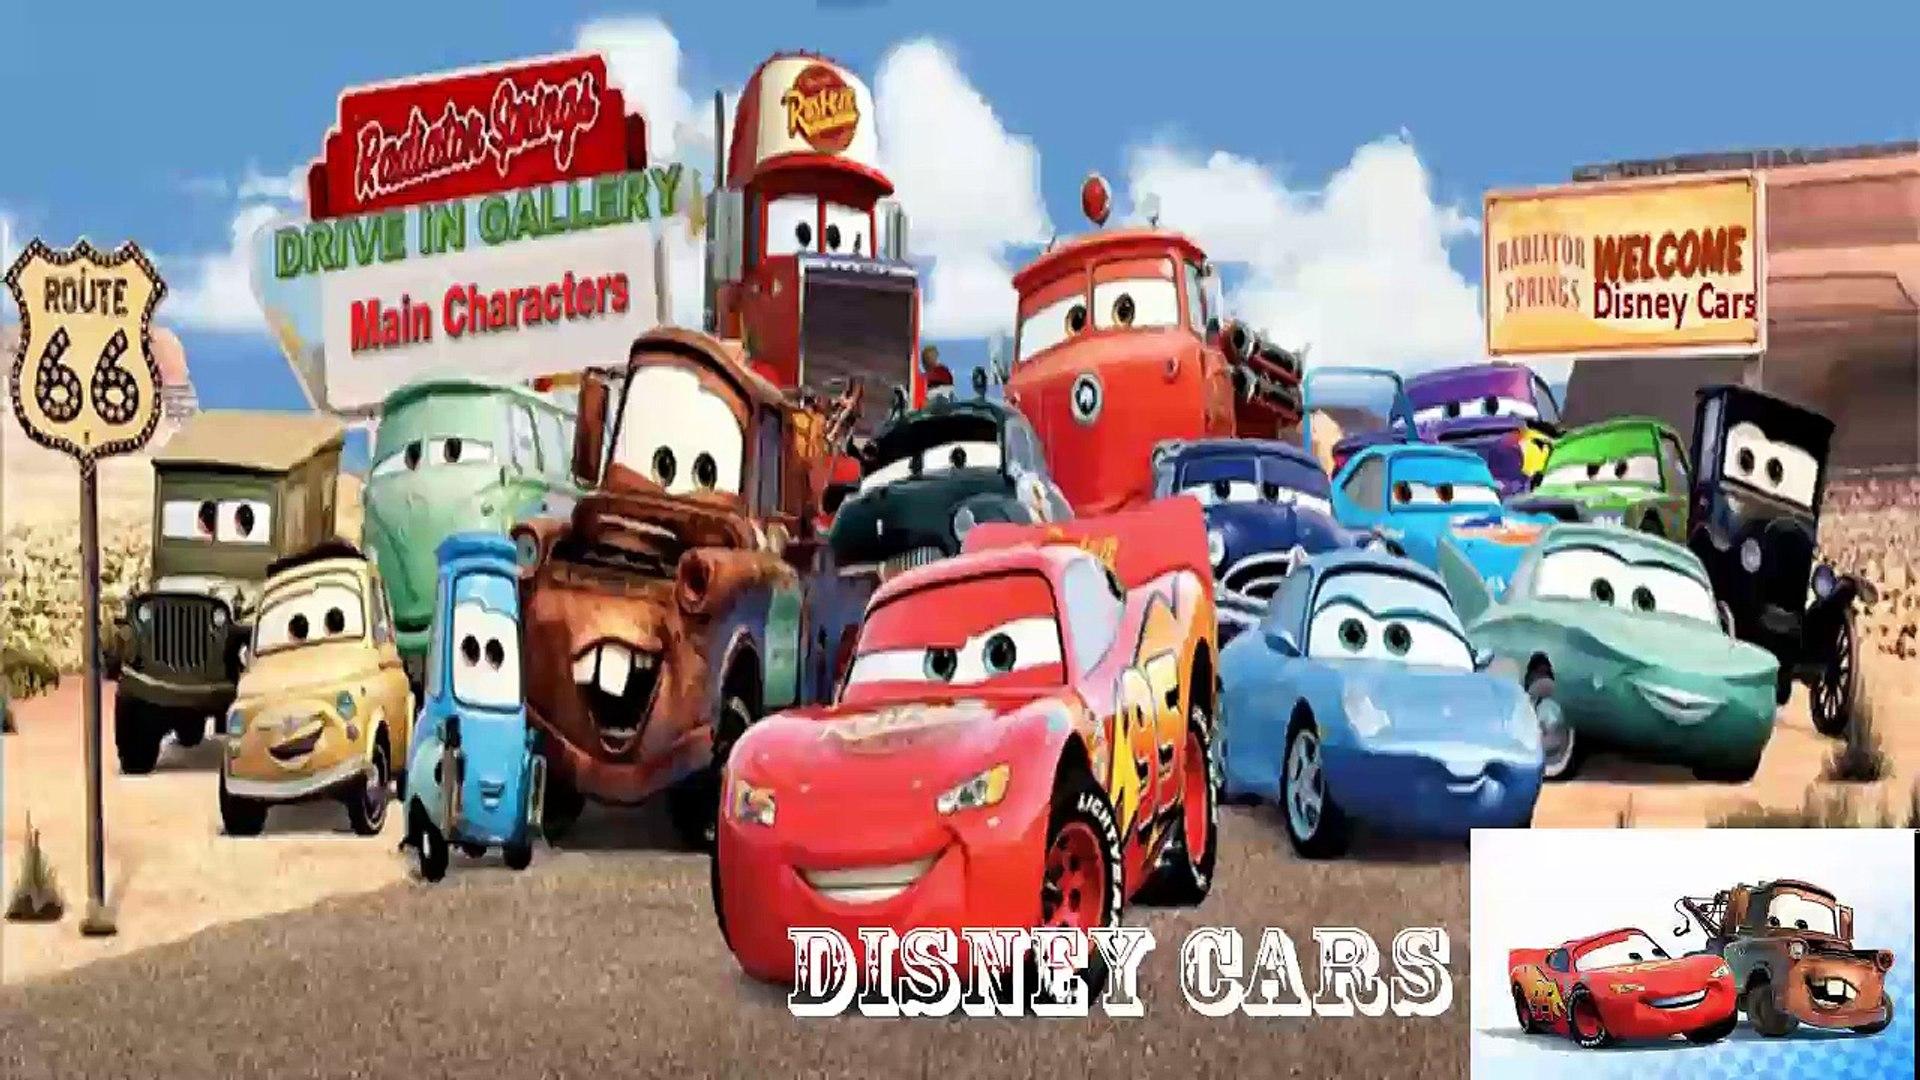 Cars 3 - Disney cars 2016 || Disney Pixar Cars Lightning McQueen | Kids Movie and The Cars 1